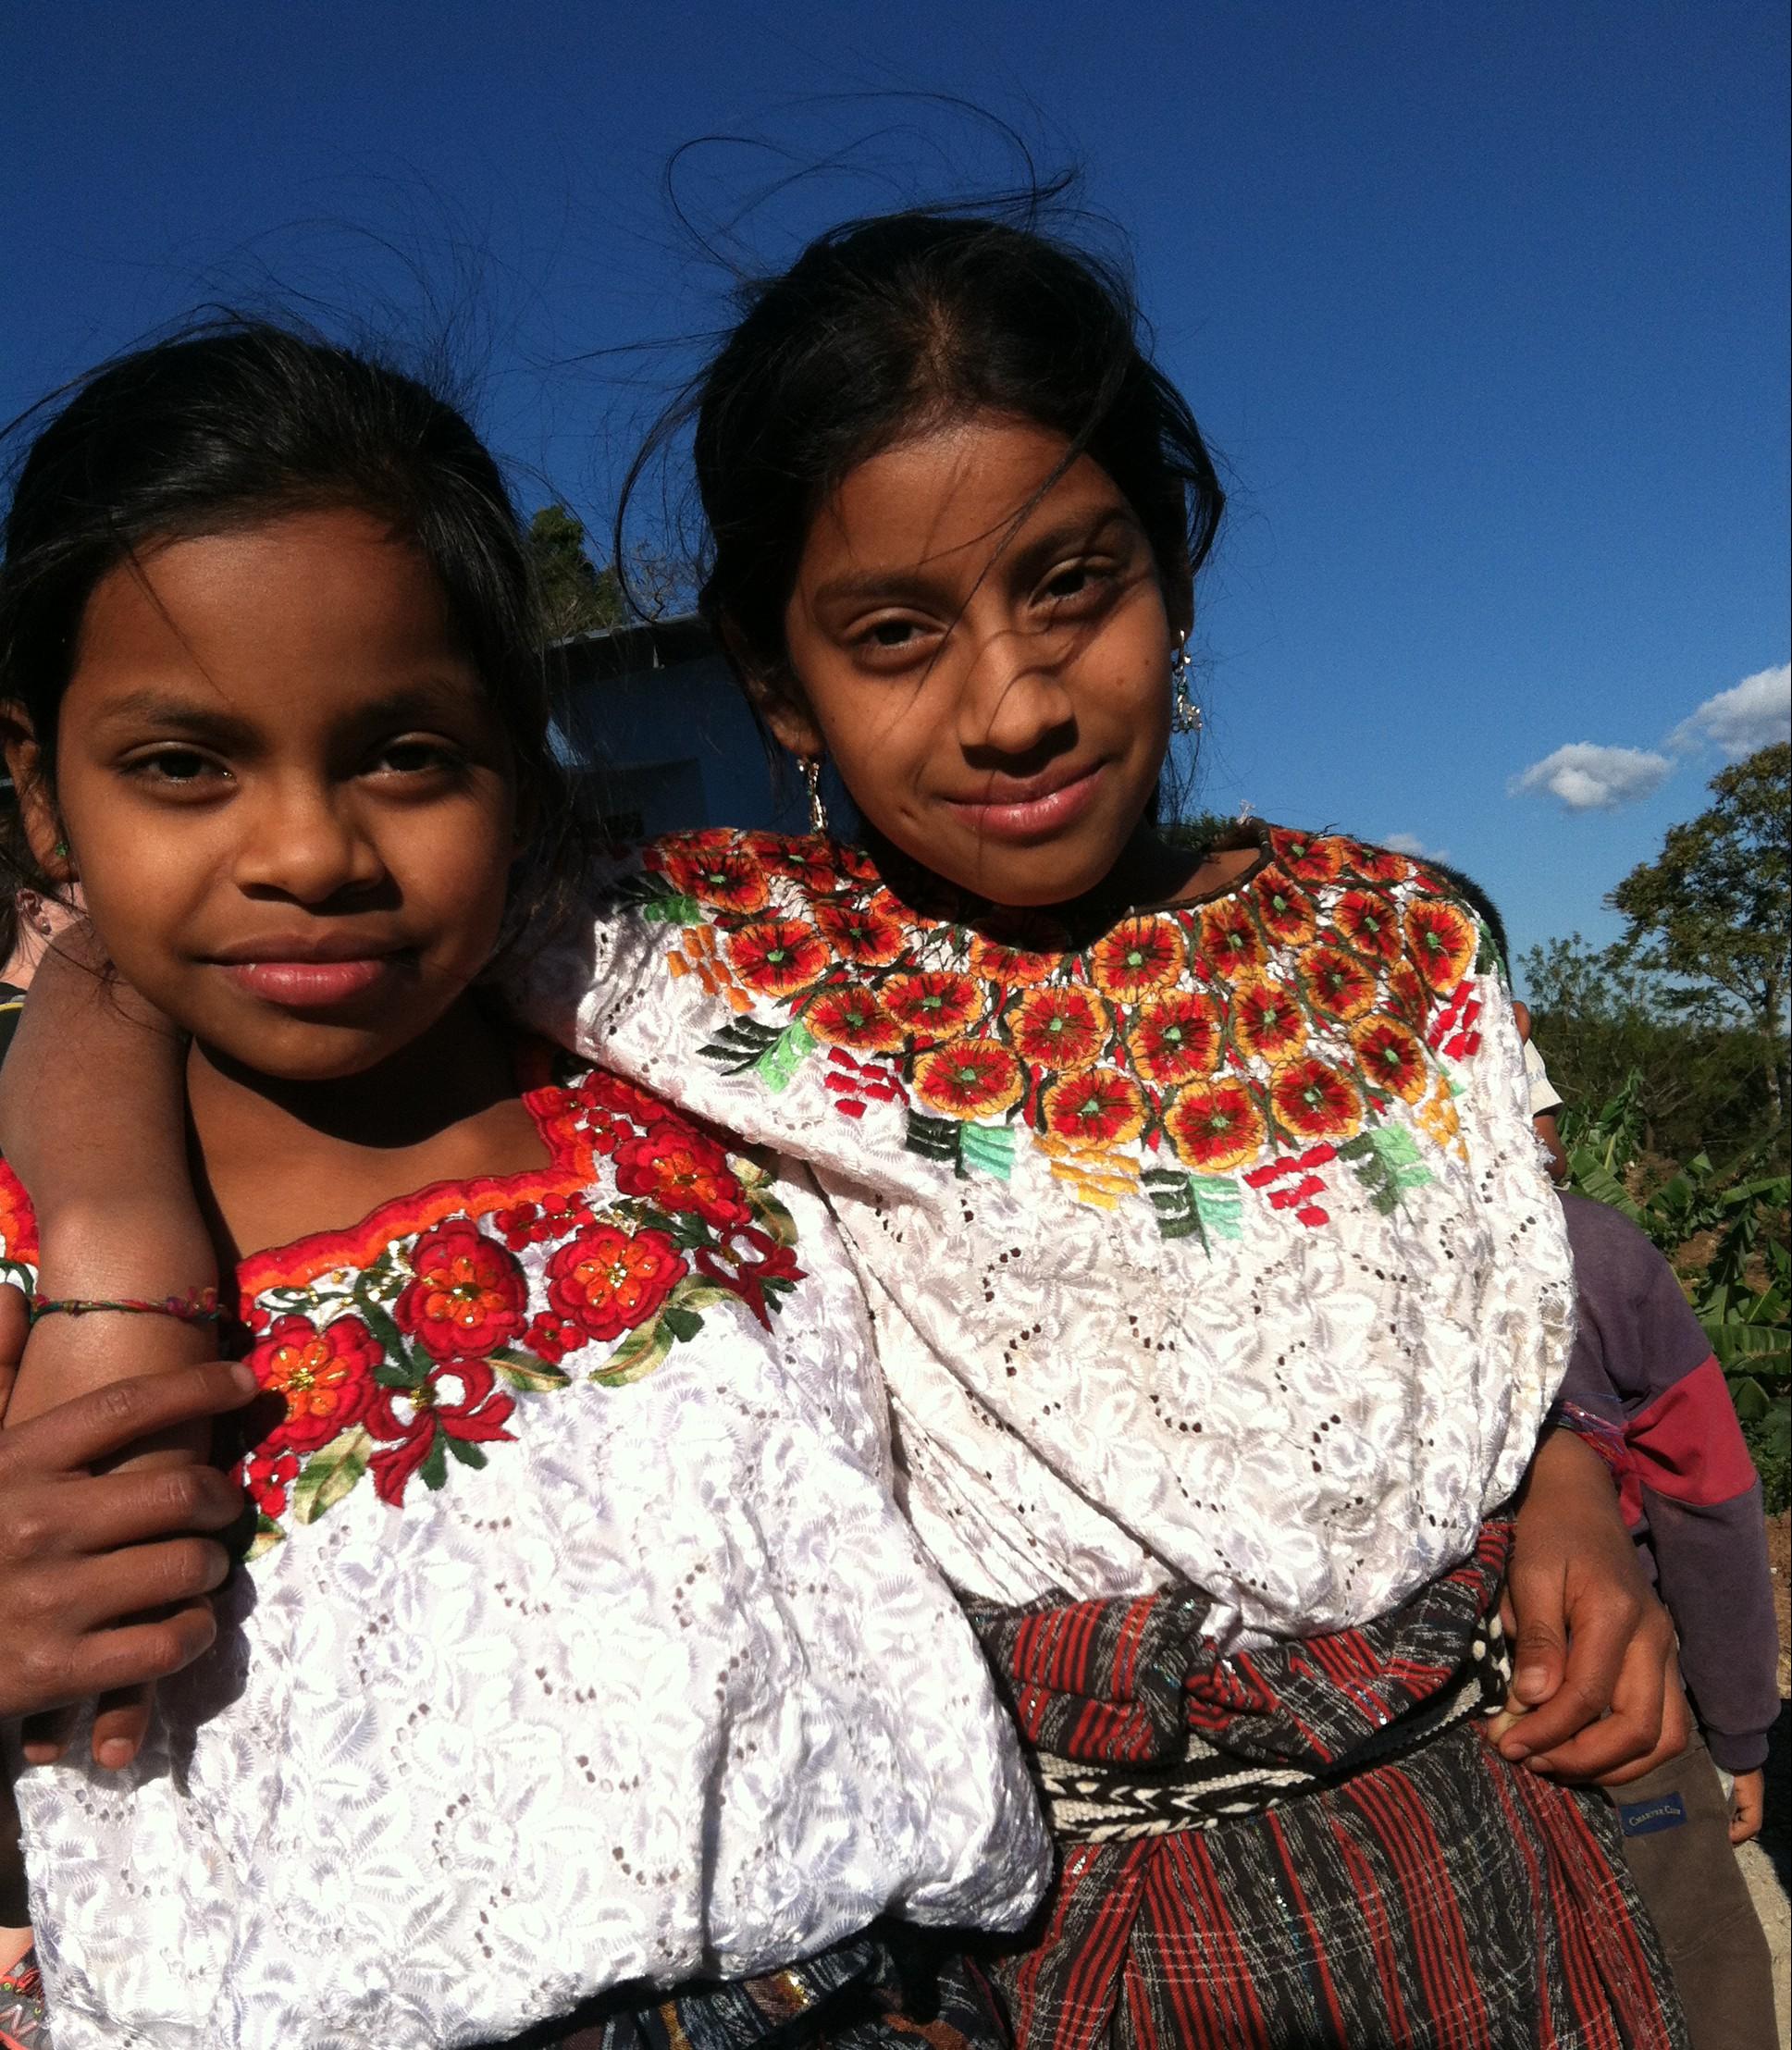 Take Me Beyond The Books To Guatemala